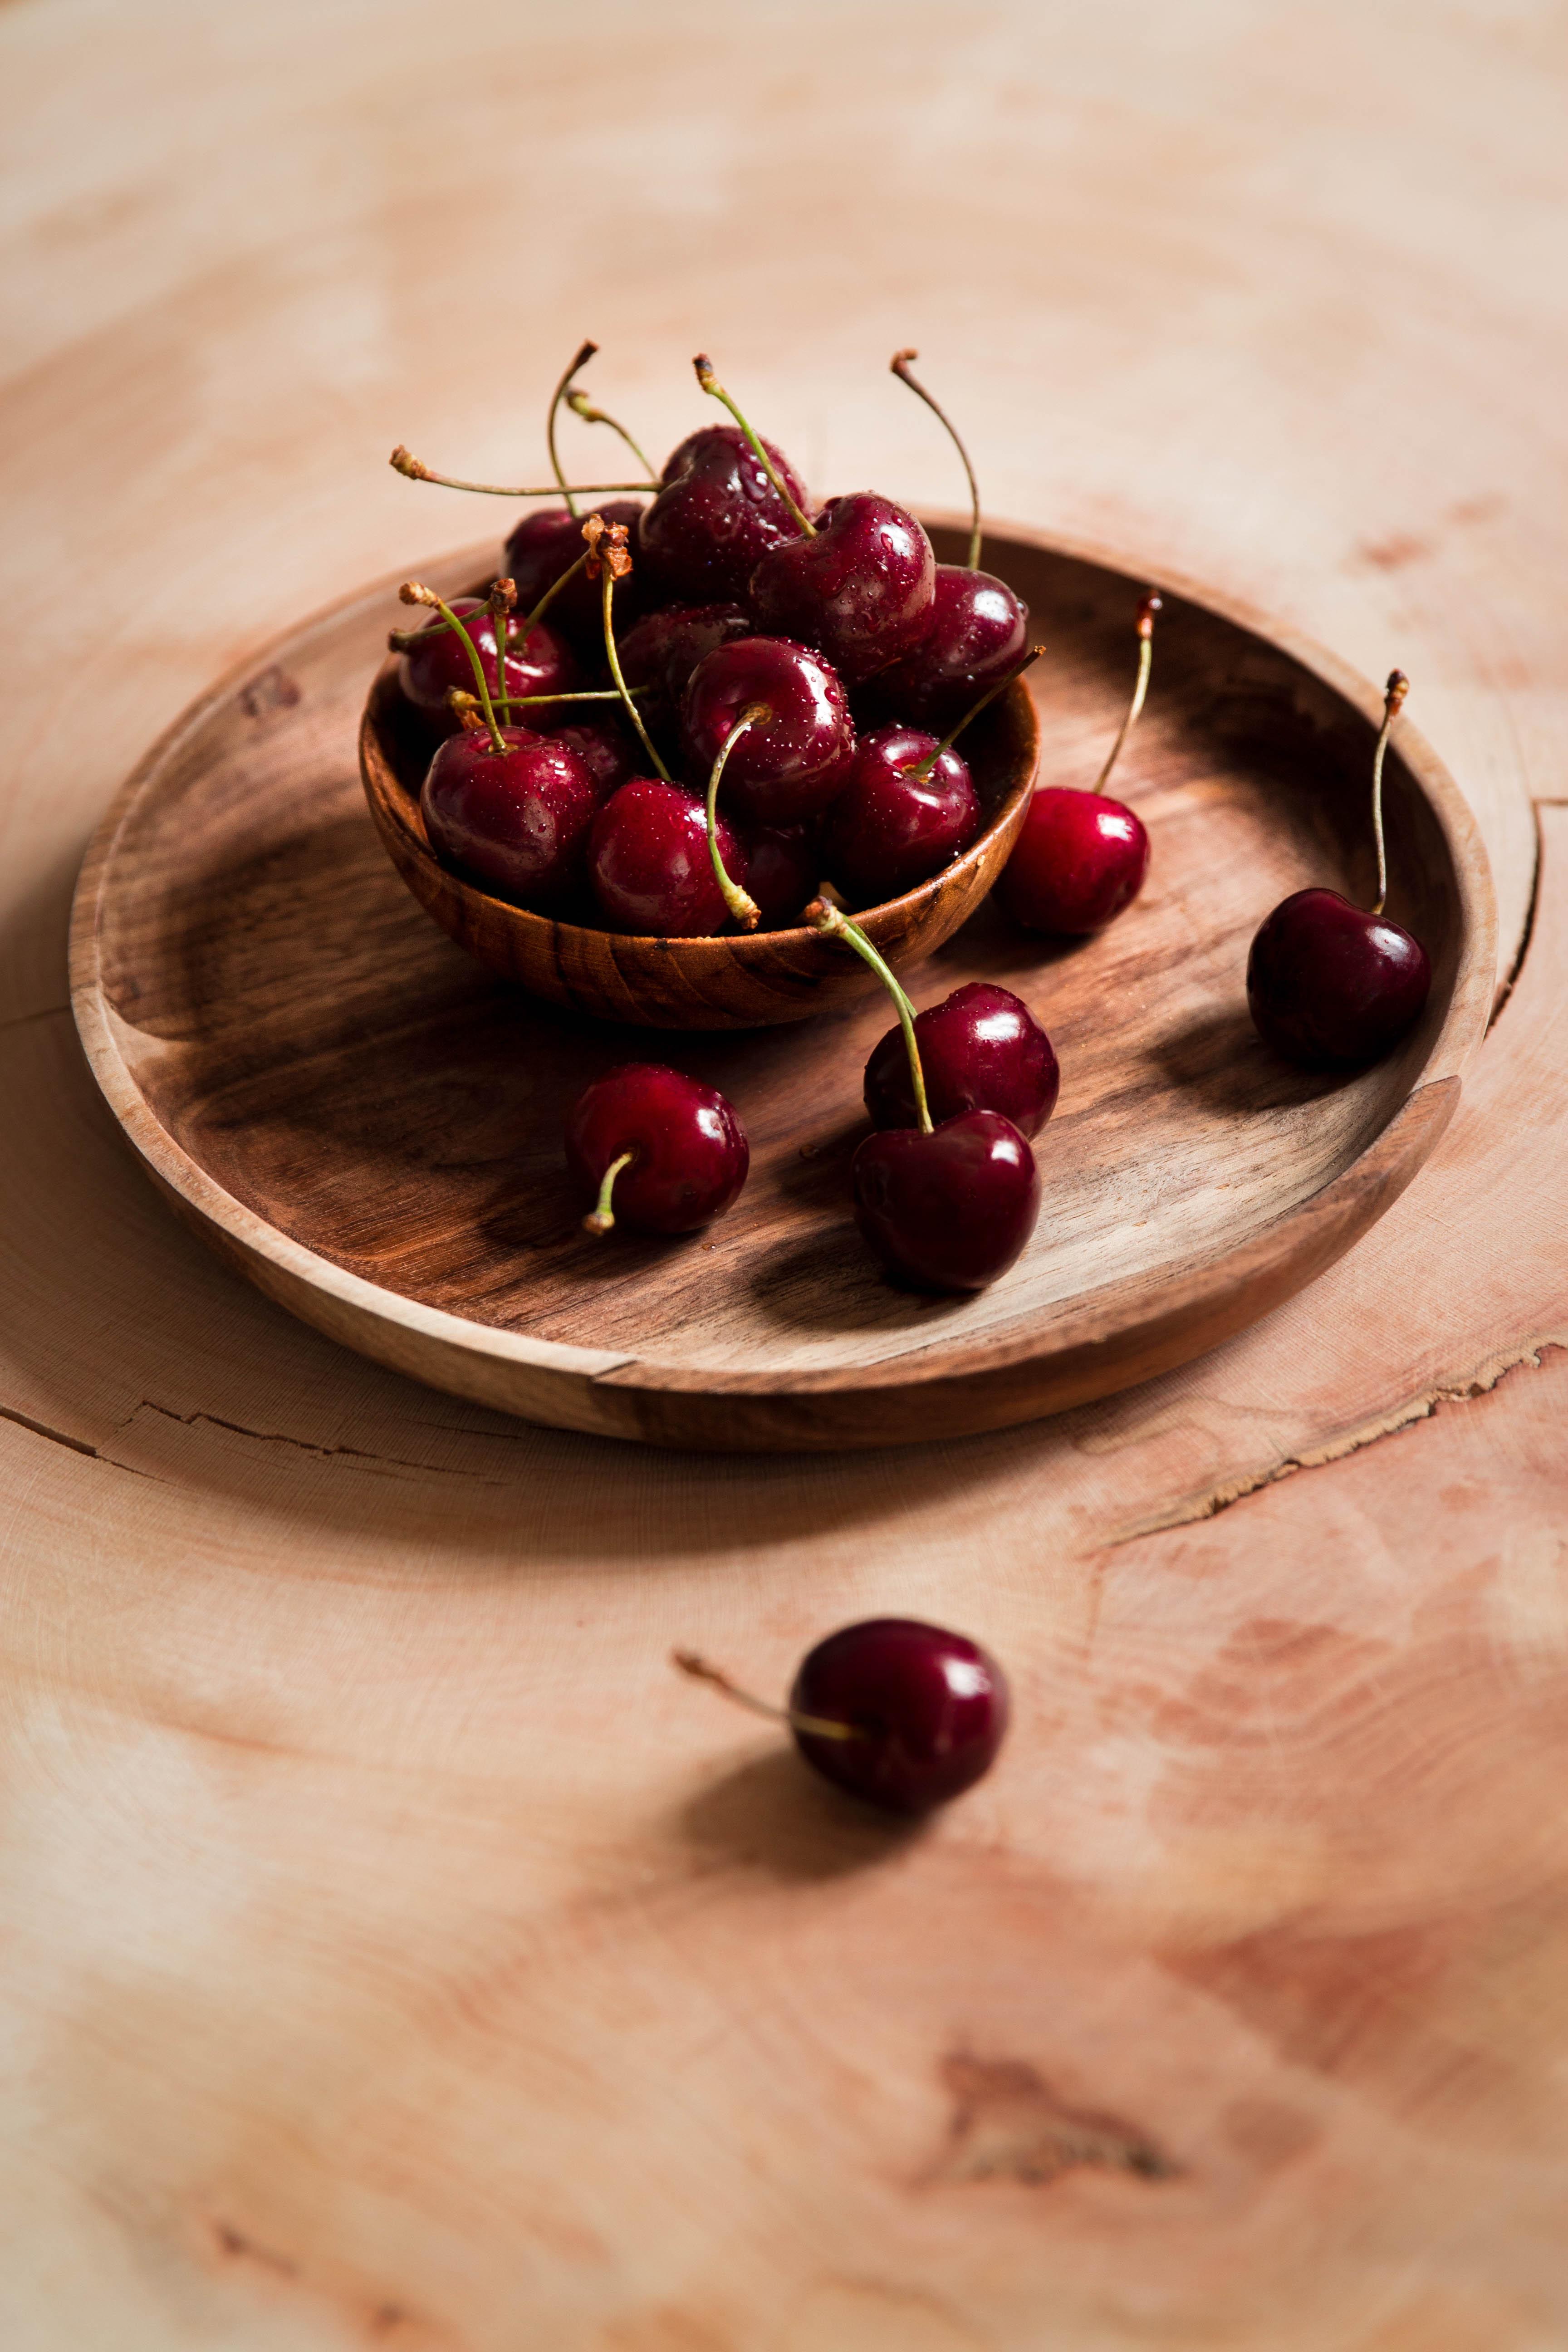 Cherry photography - portfolio madamcadamia